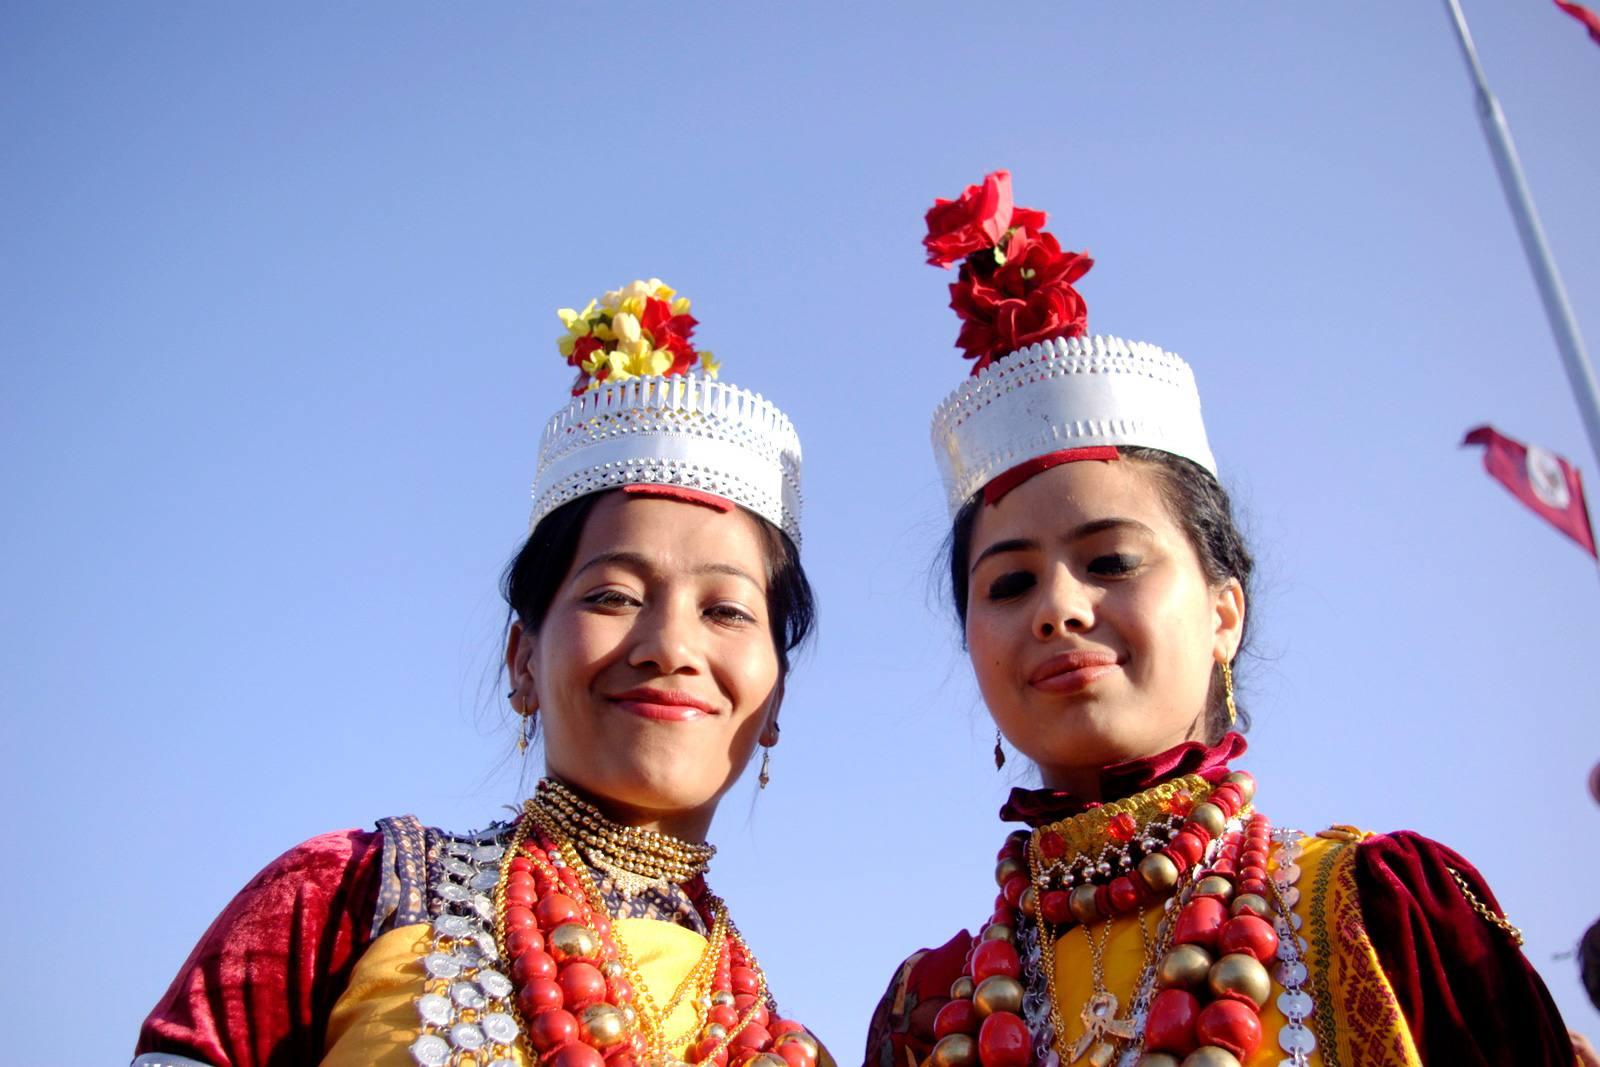 Khasi girls in traditional dress